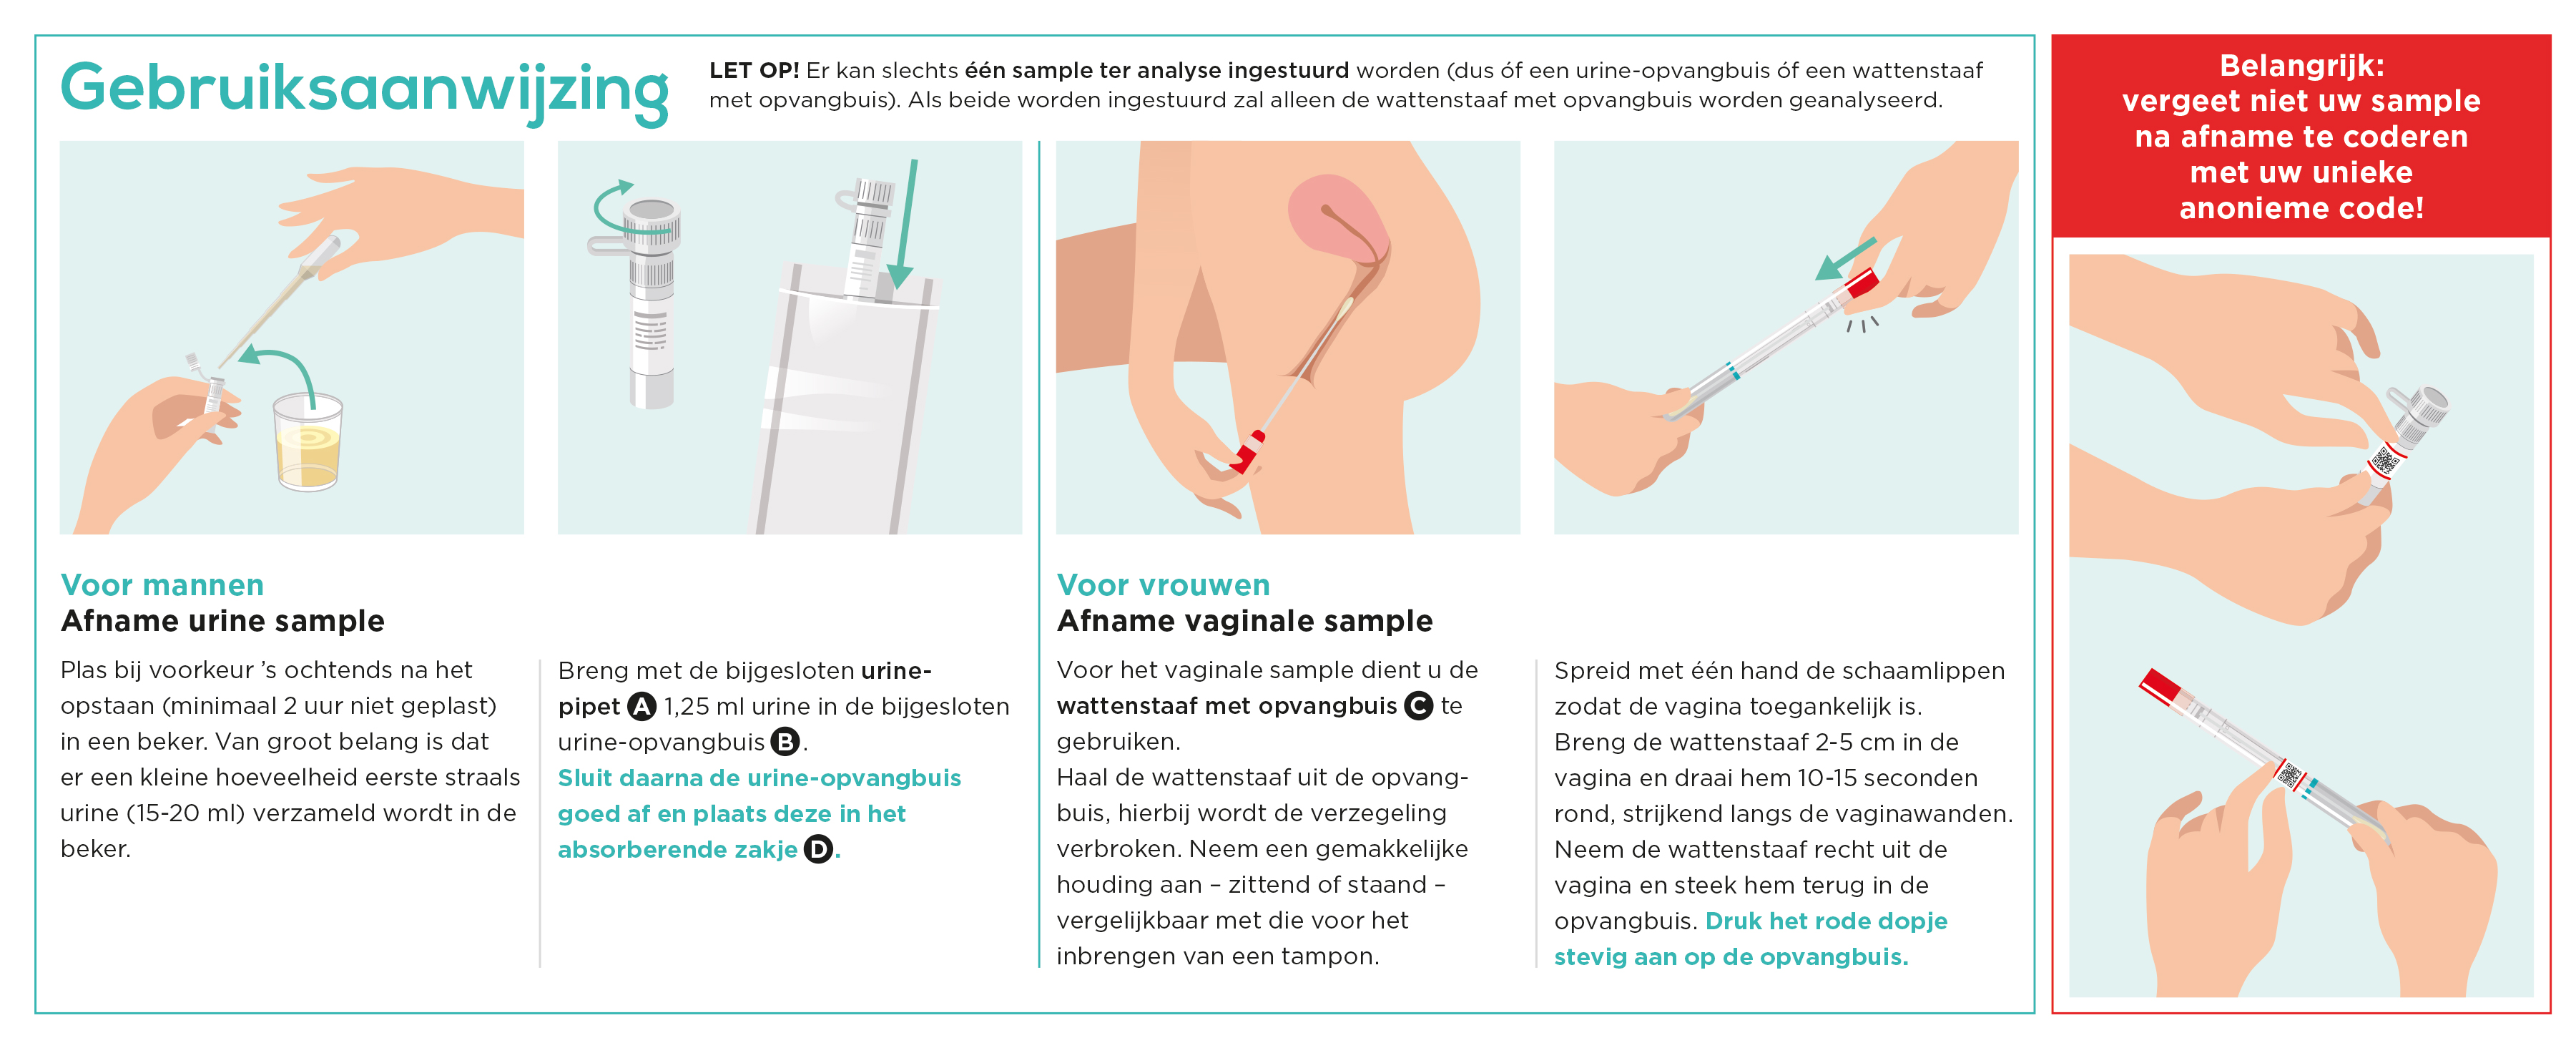 Gebruiksaanwijzing SOA-test vaginaal of urine